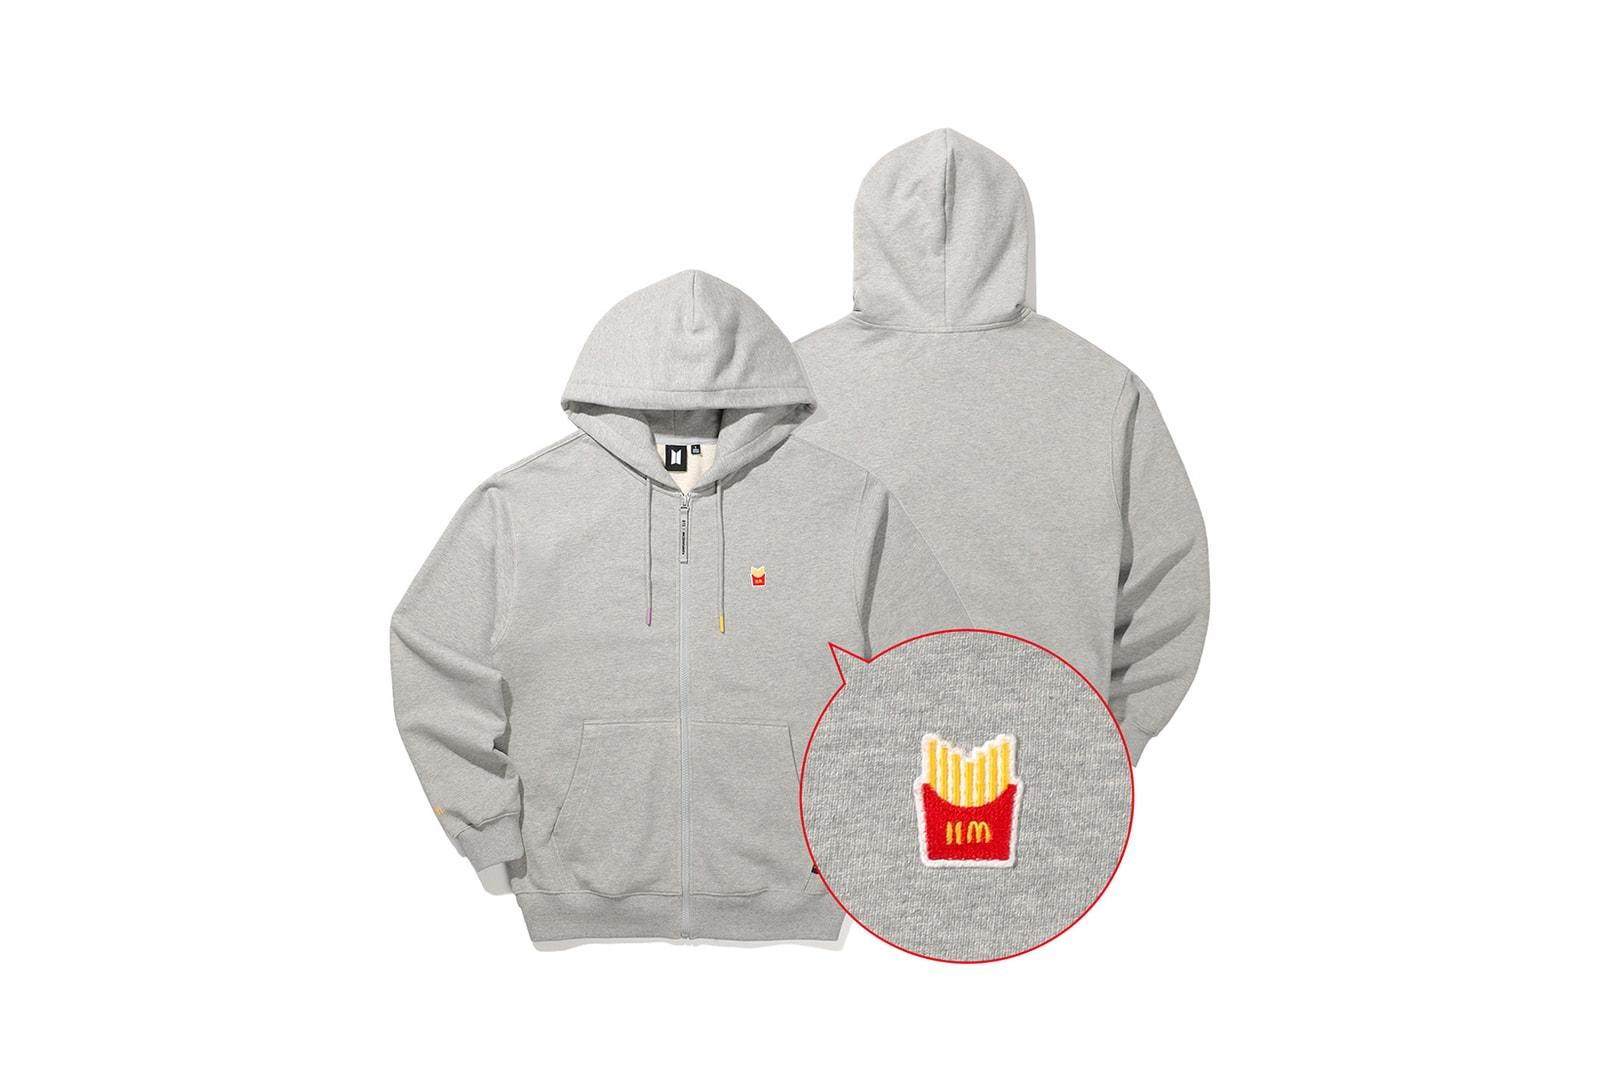 BTS x McDonald's Meal Collaboration Merchandise